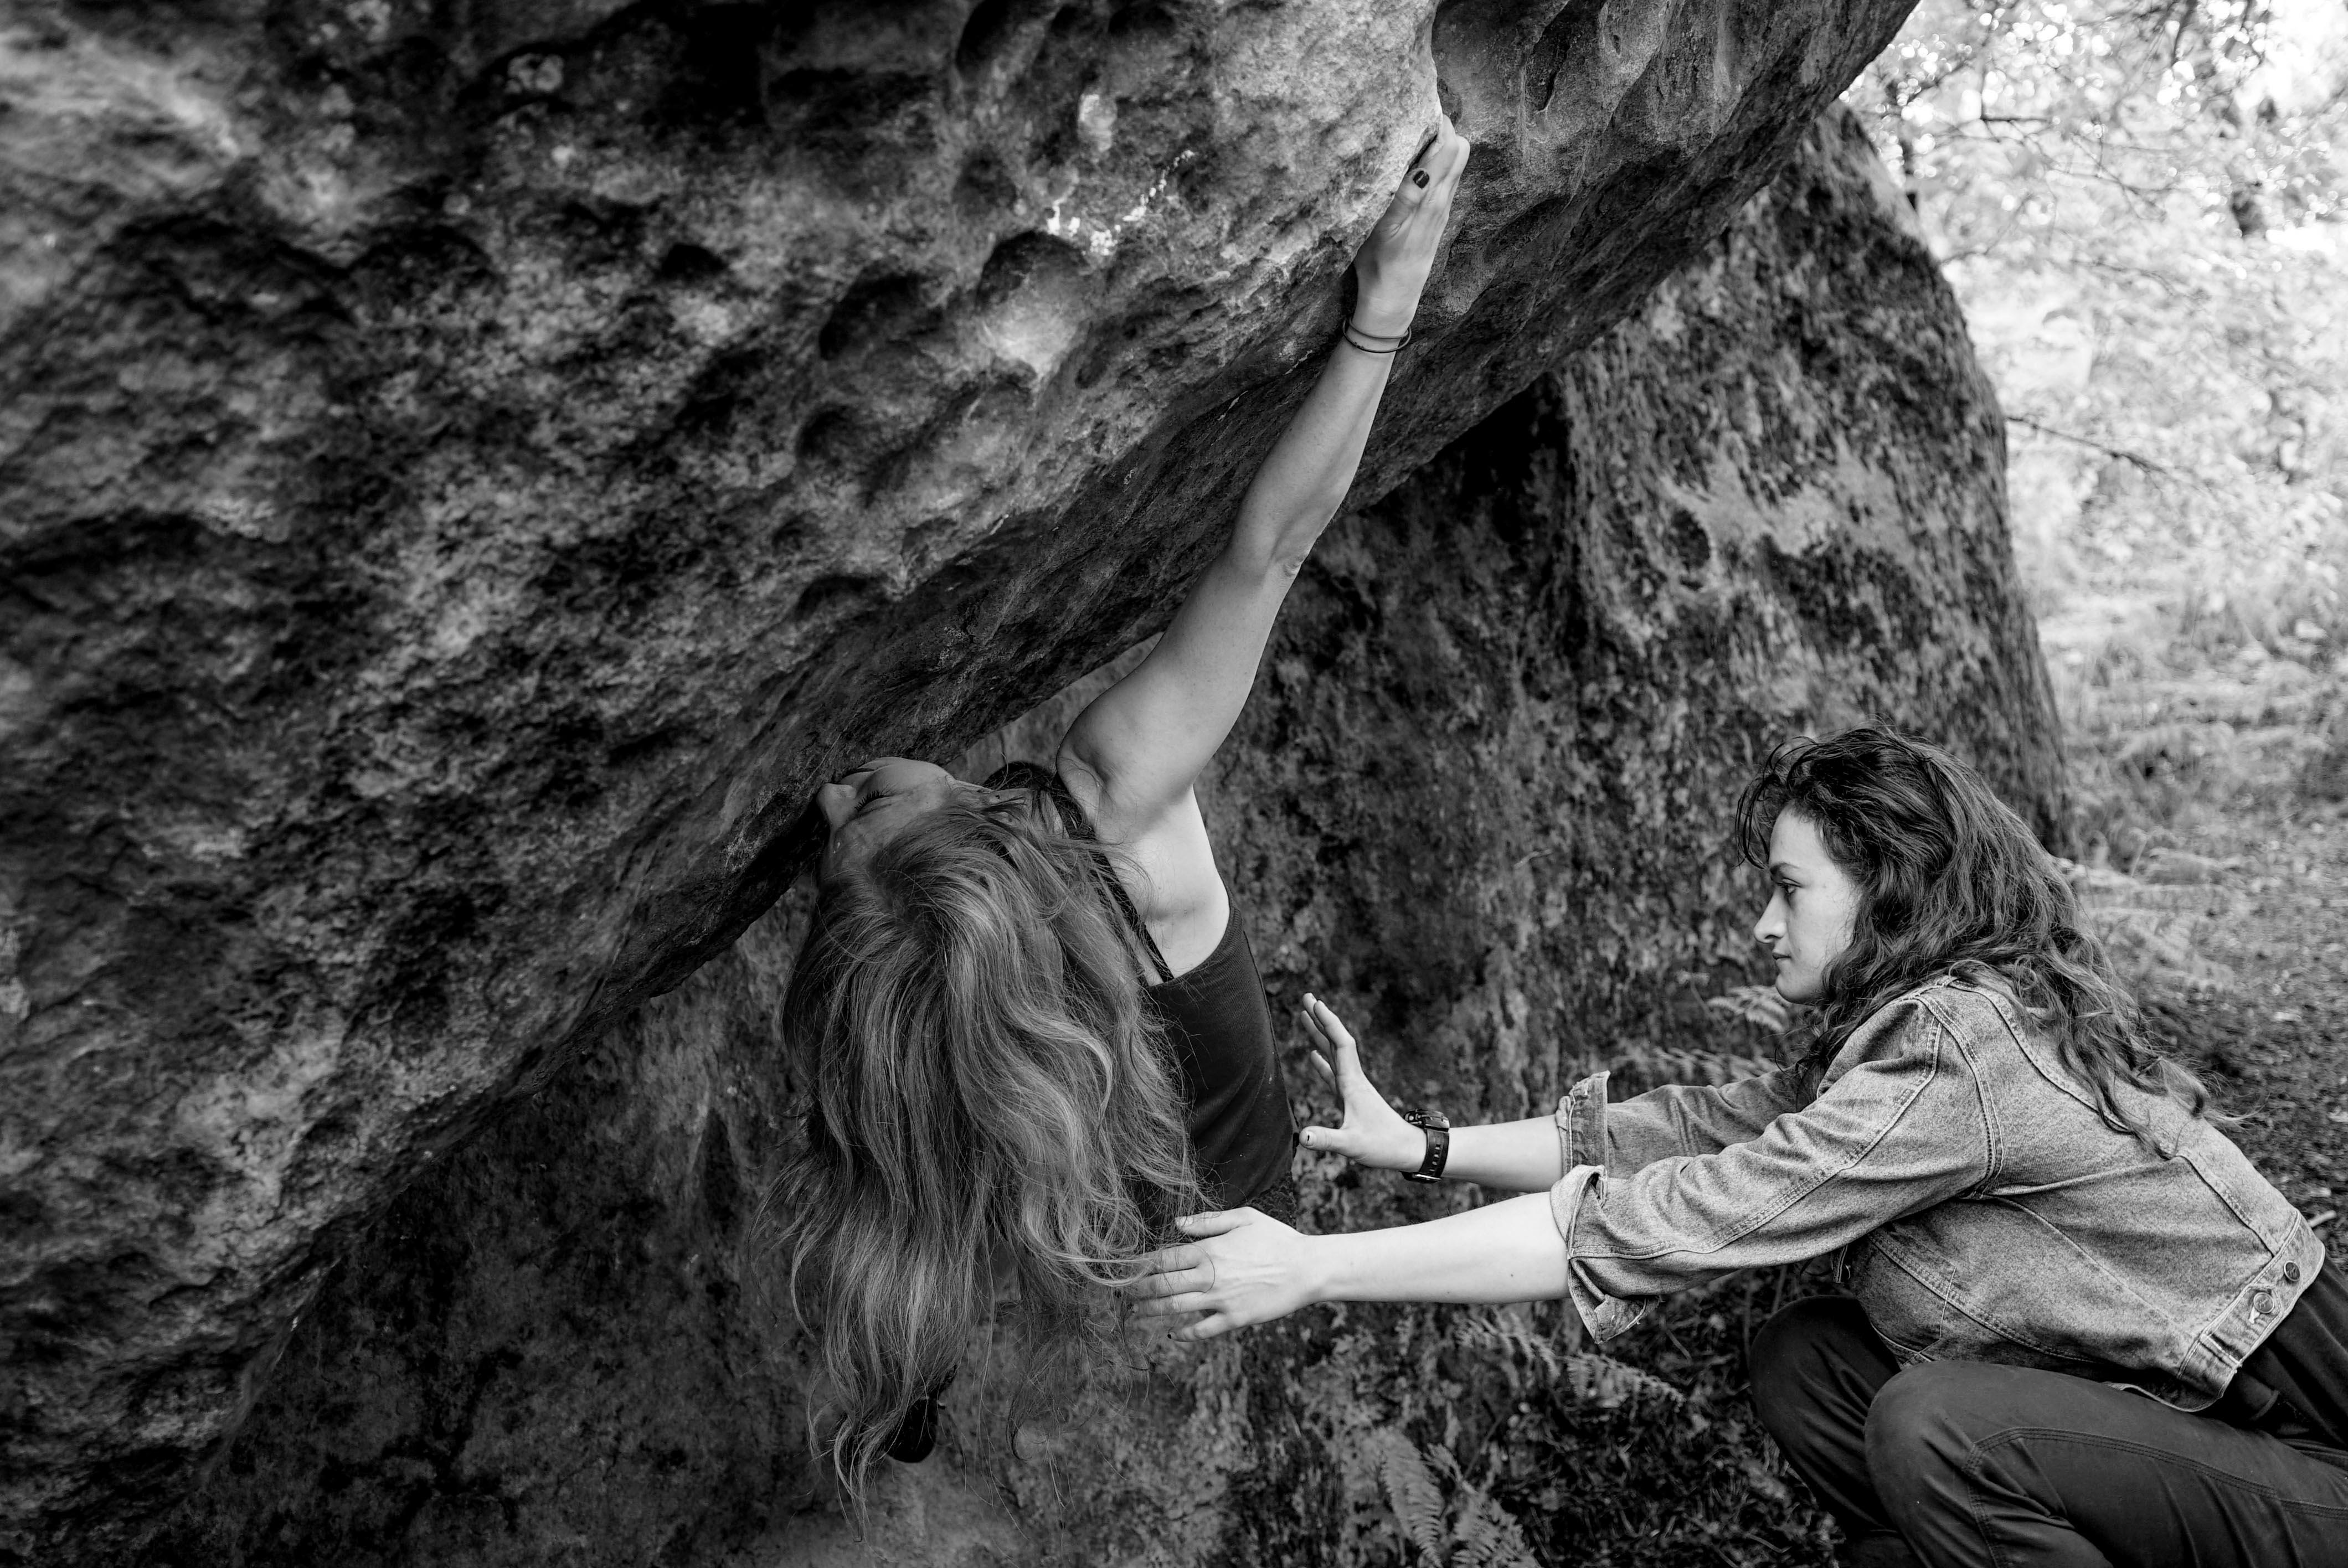 fontainbleau climbing 2016 mike brindley-20